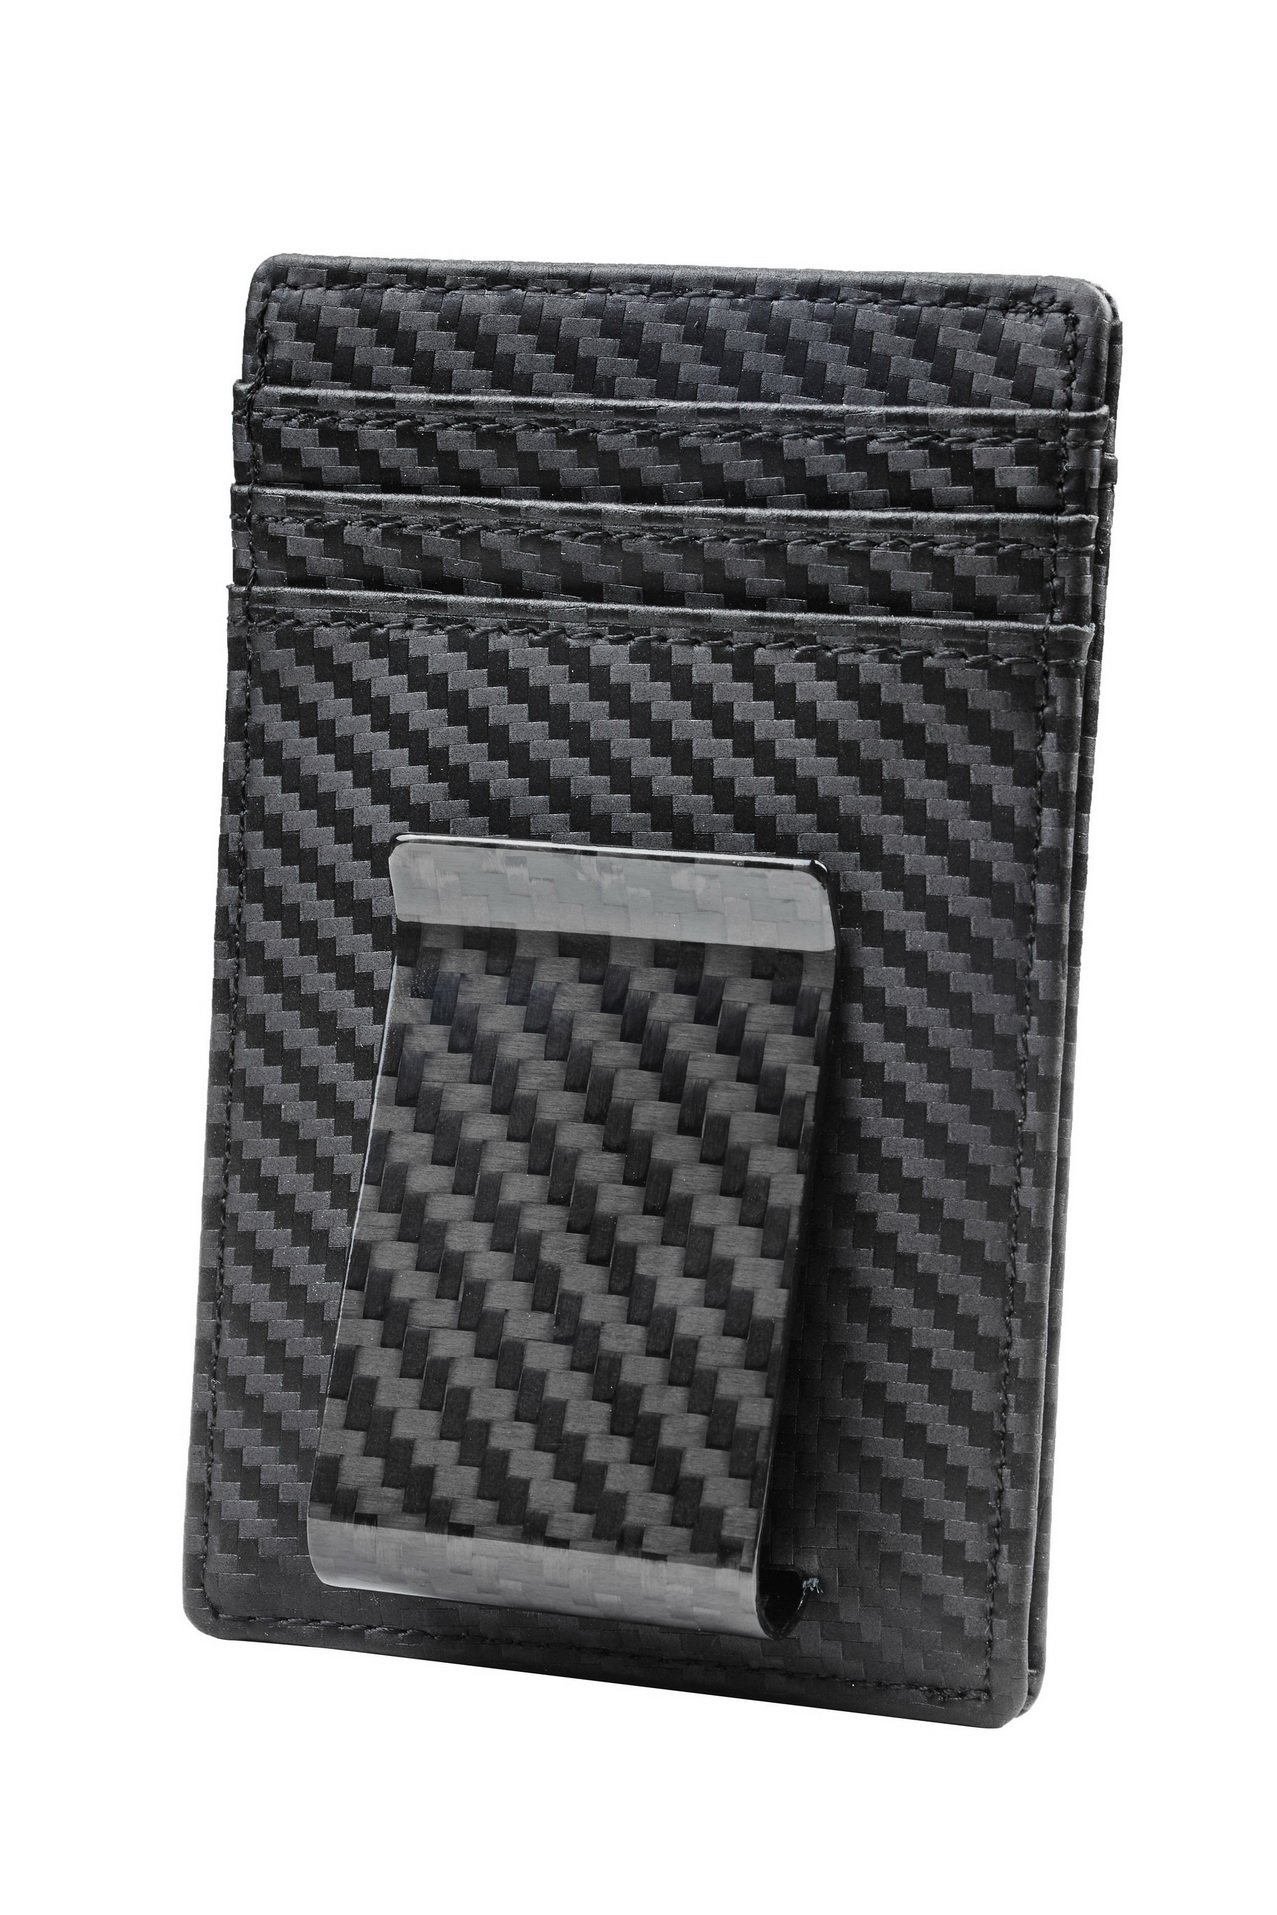 Travelambo Money Clip Front Pocket Wallet Slim Minimalist Wallet RFID Blocking (01 carbon fiber elite) by Travelambo (Image #1)